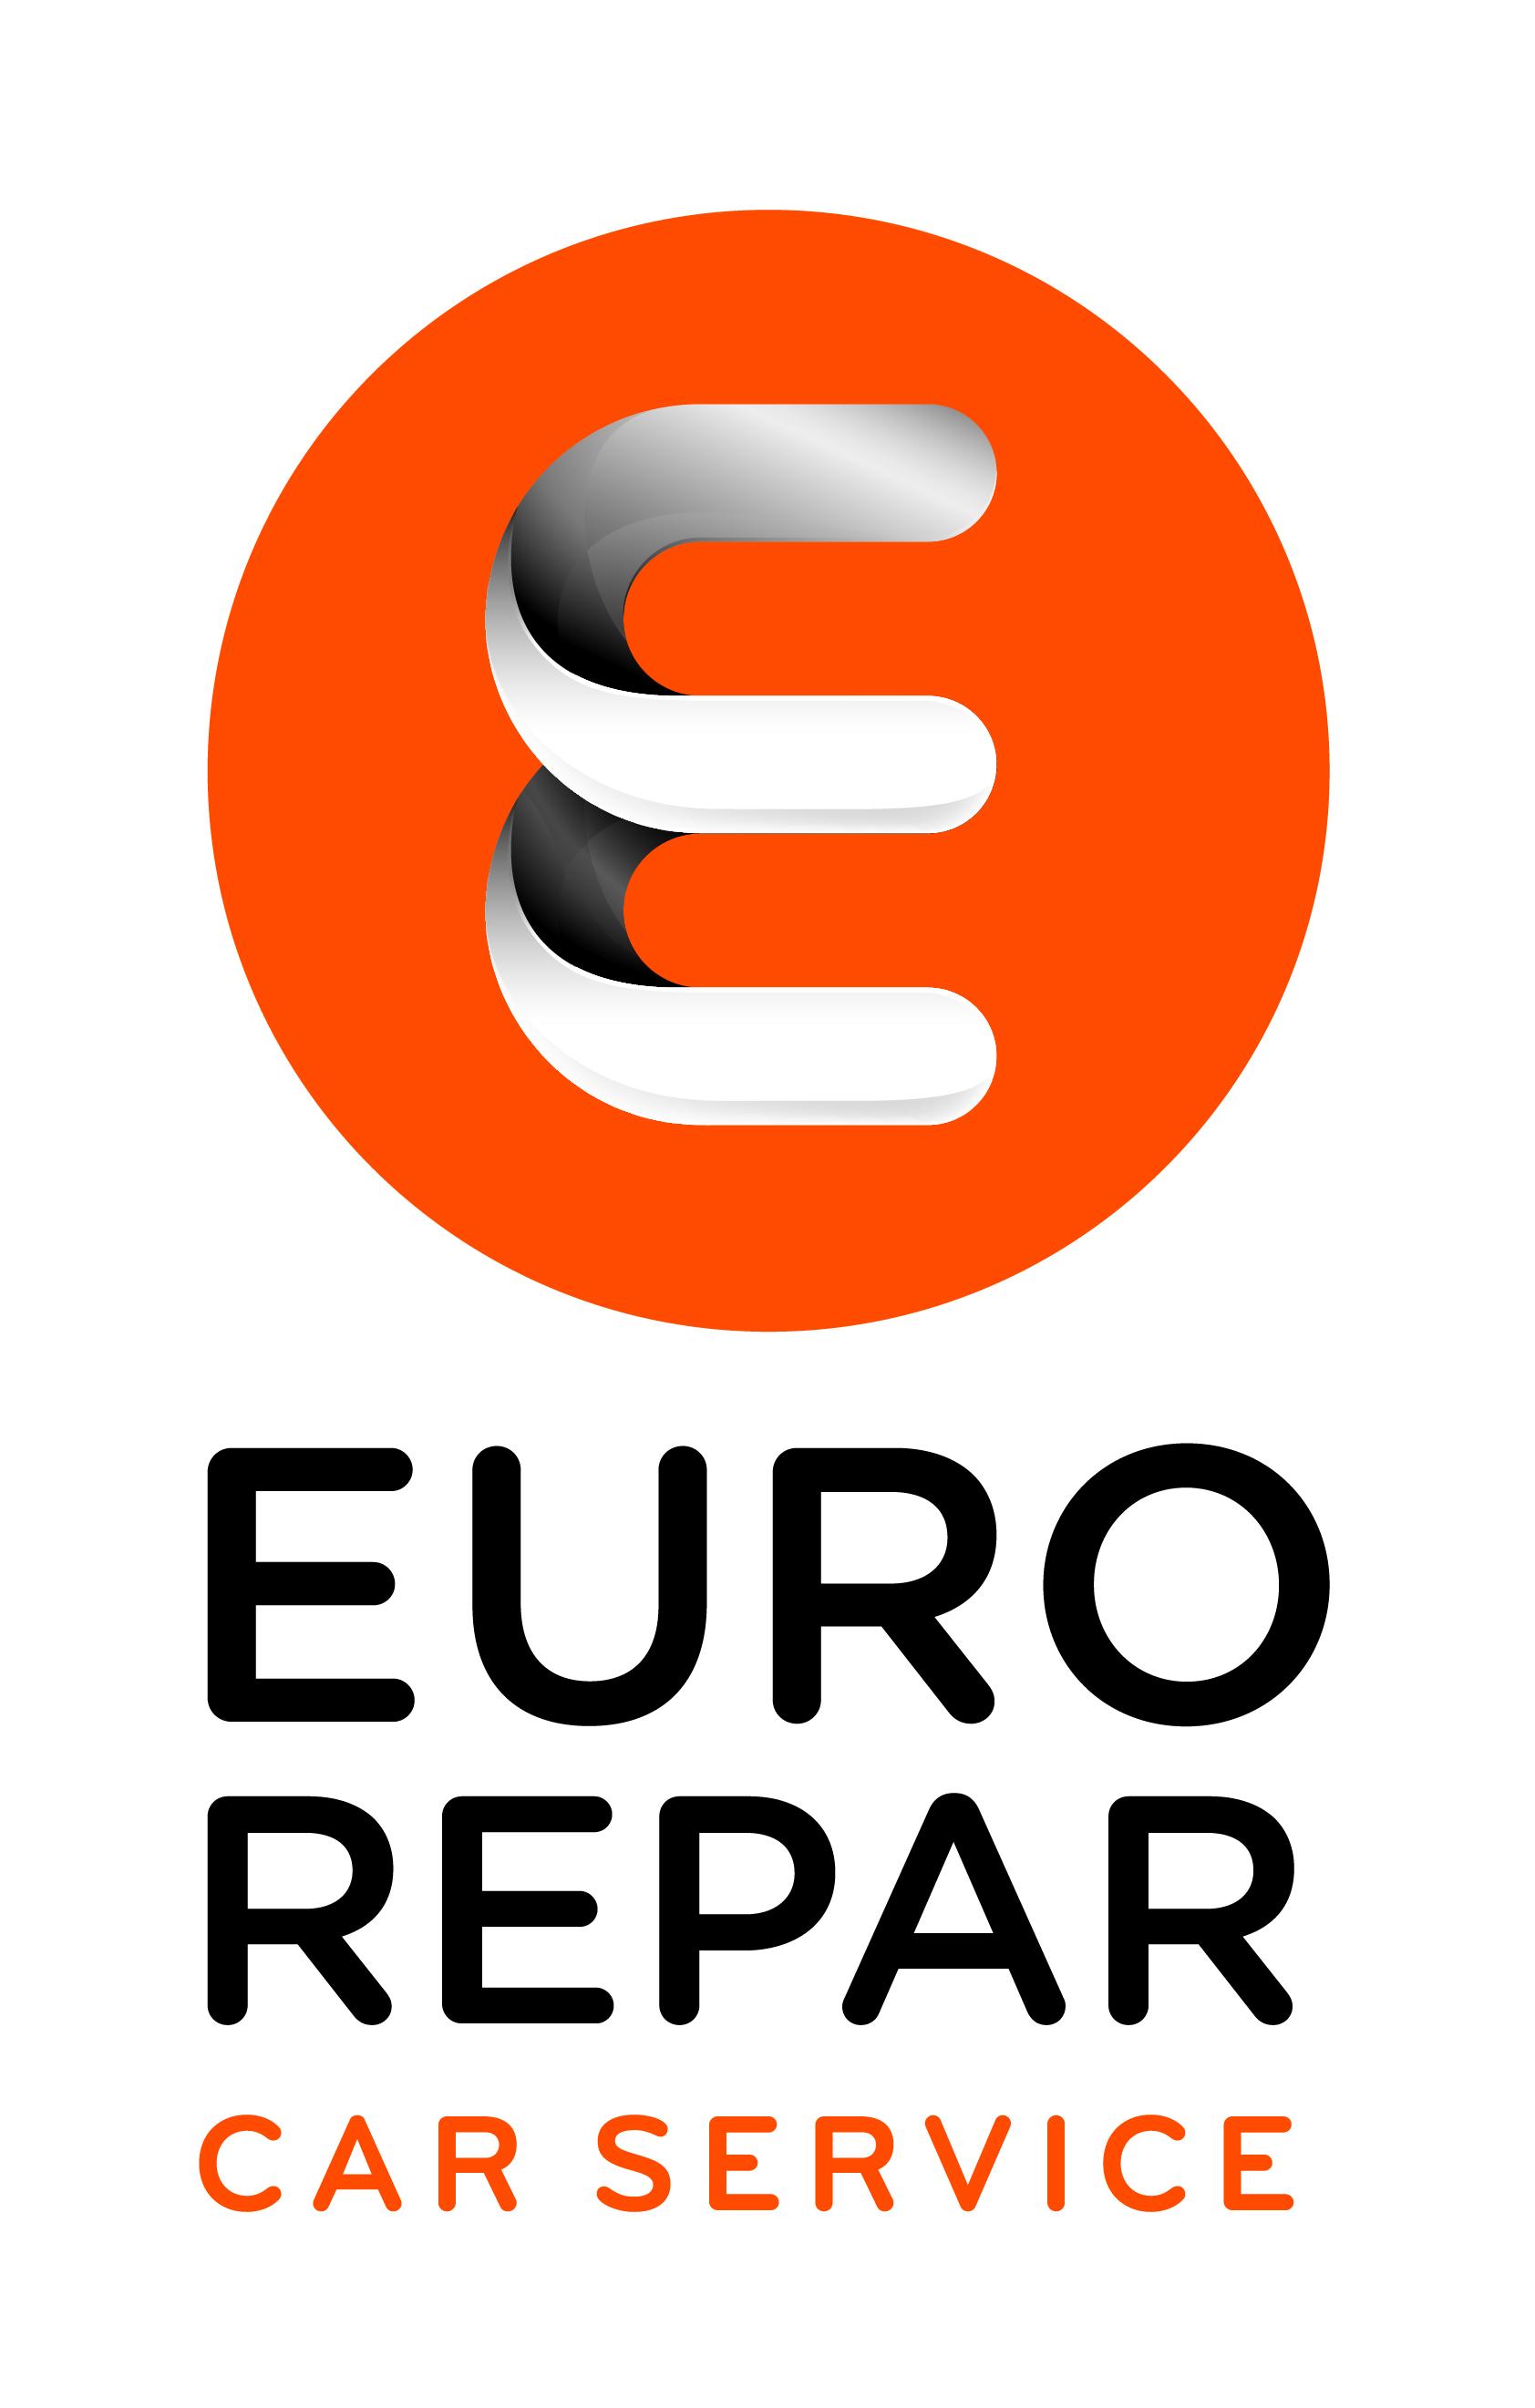 Eurorepar Car Service Postert logo